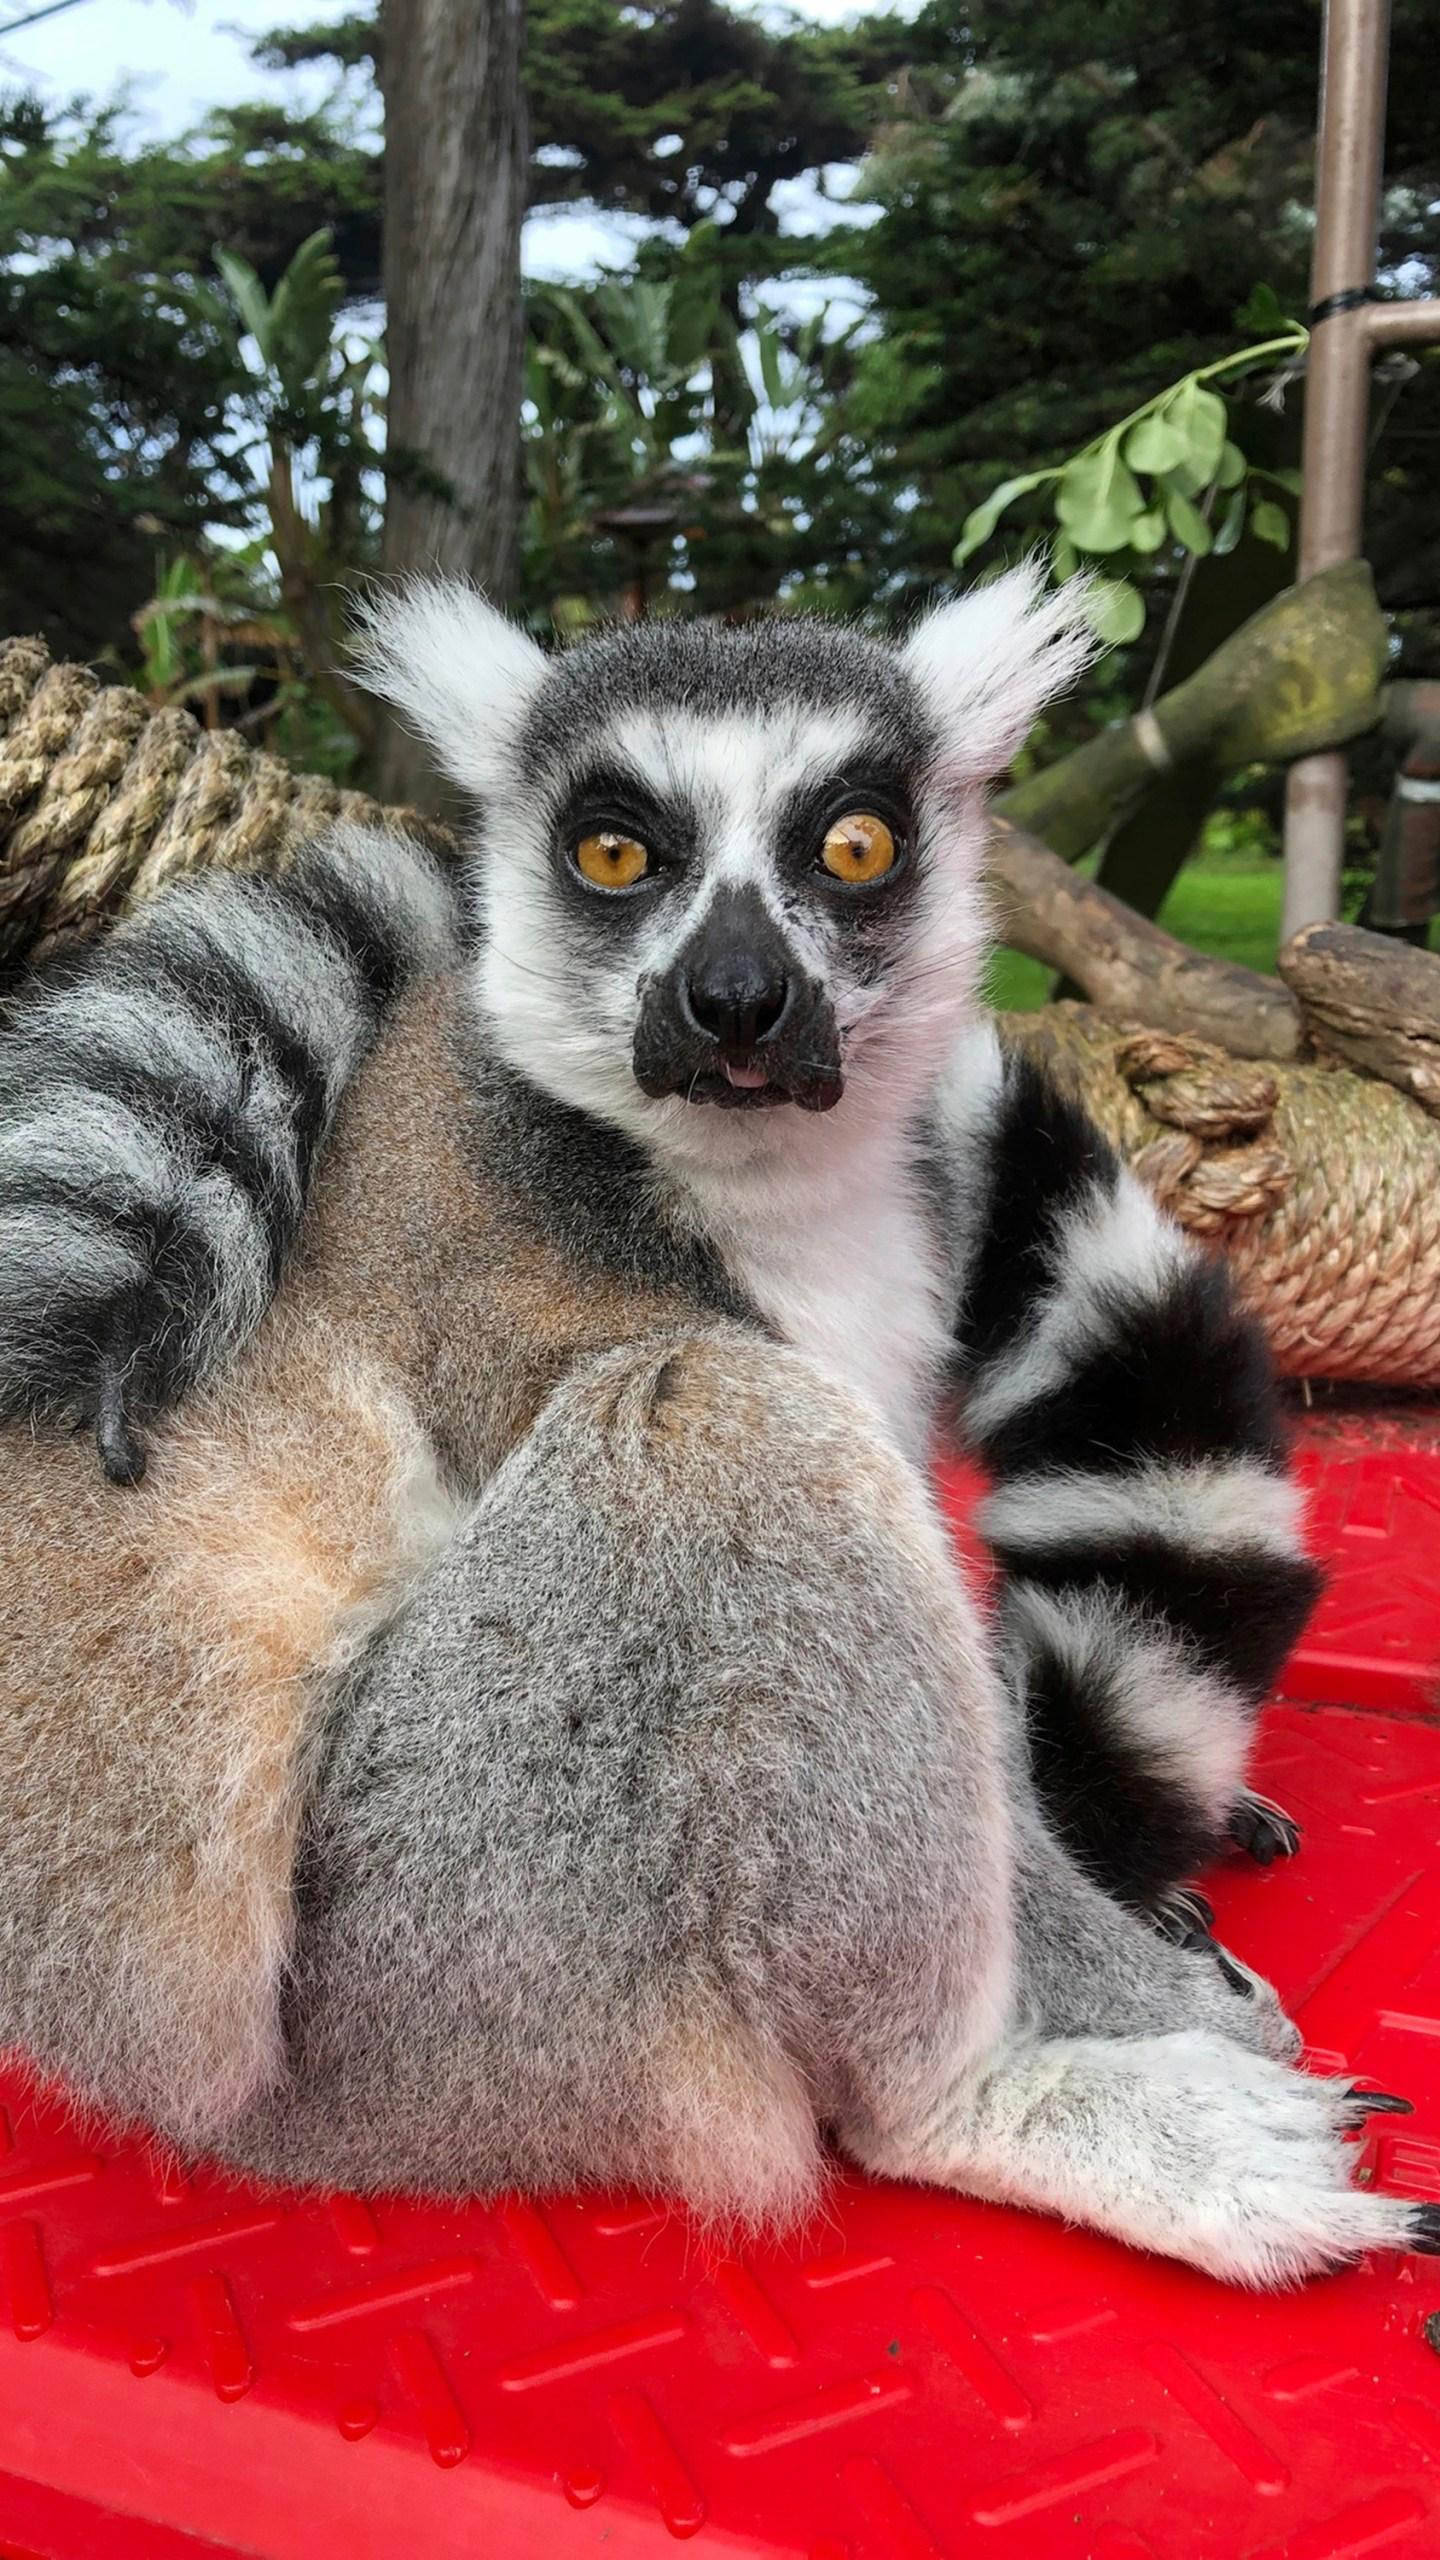 Sf Zoo Christmas Lights 2020 Police: Endangered lemur stolen in break in at San Francisco Zoo